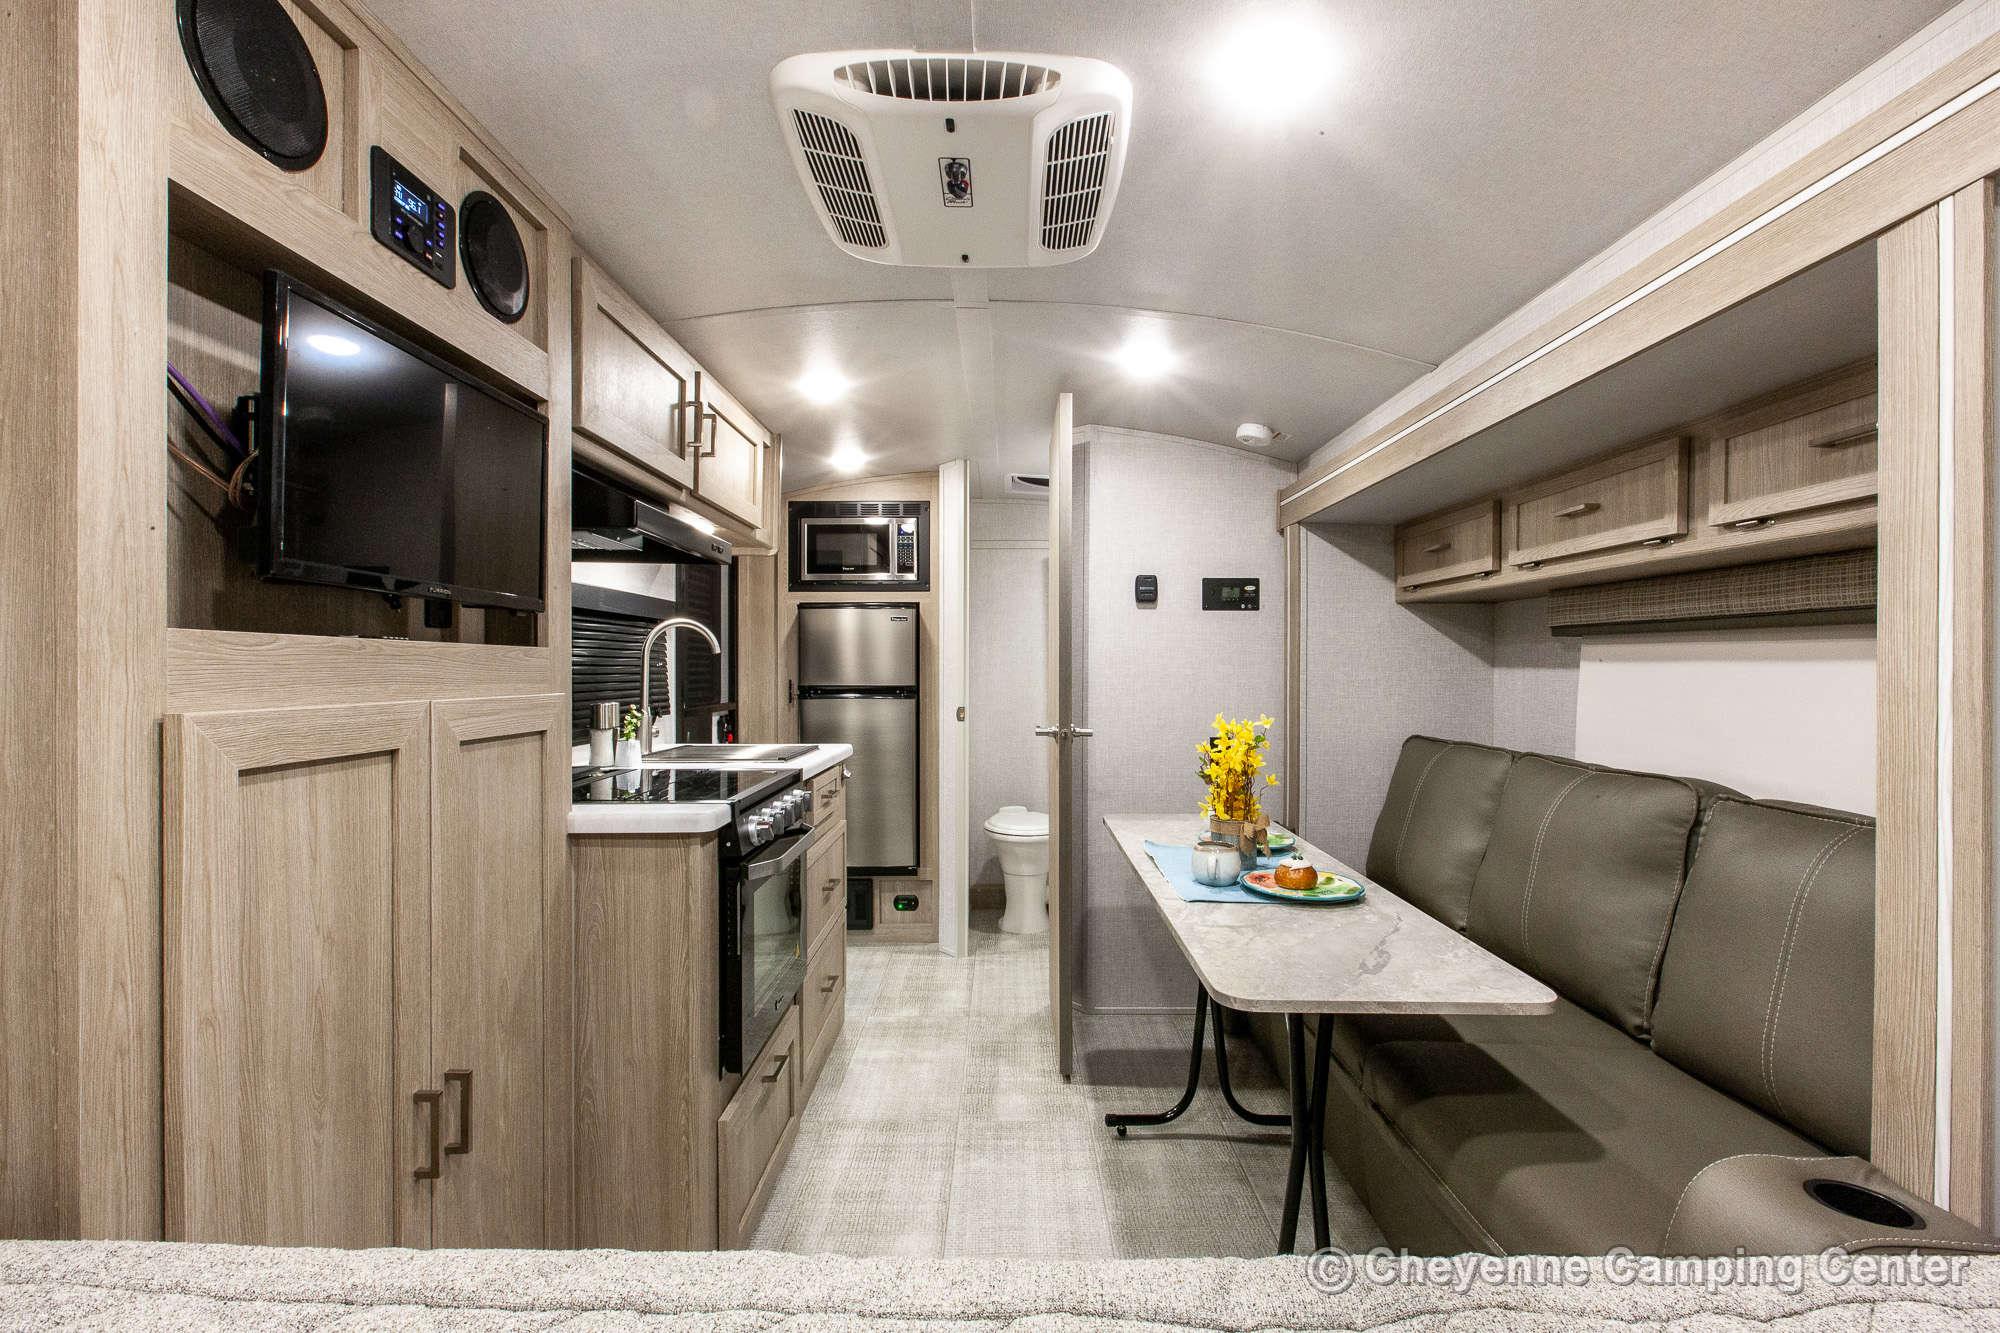 2021 Forest River Flagstaff E-Pro E19FBS Travel Trailer Interior Image